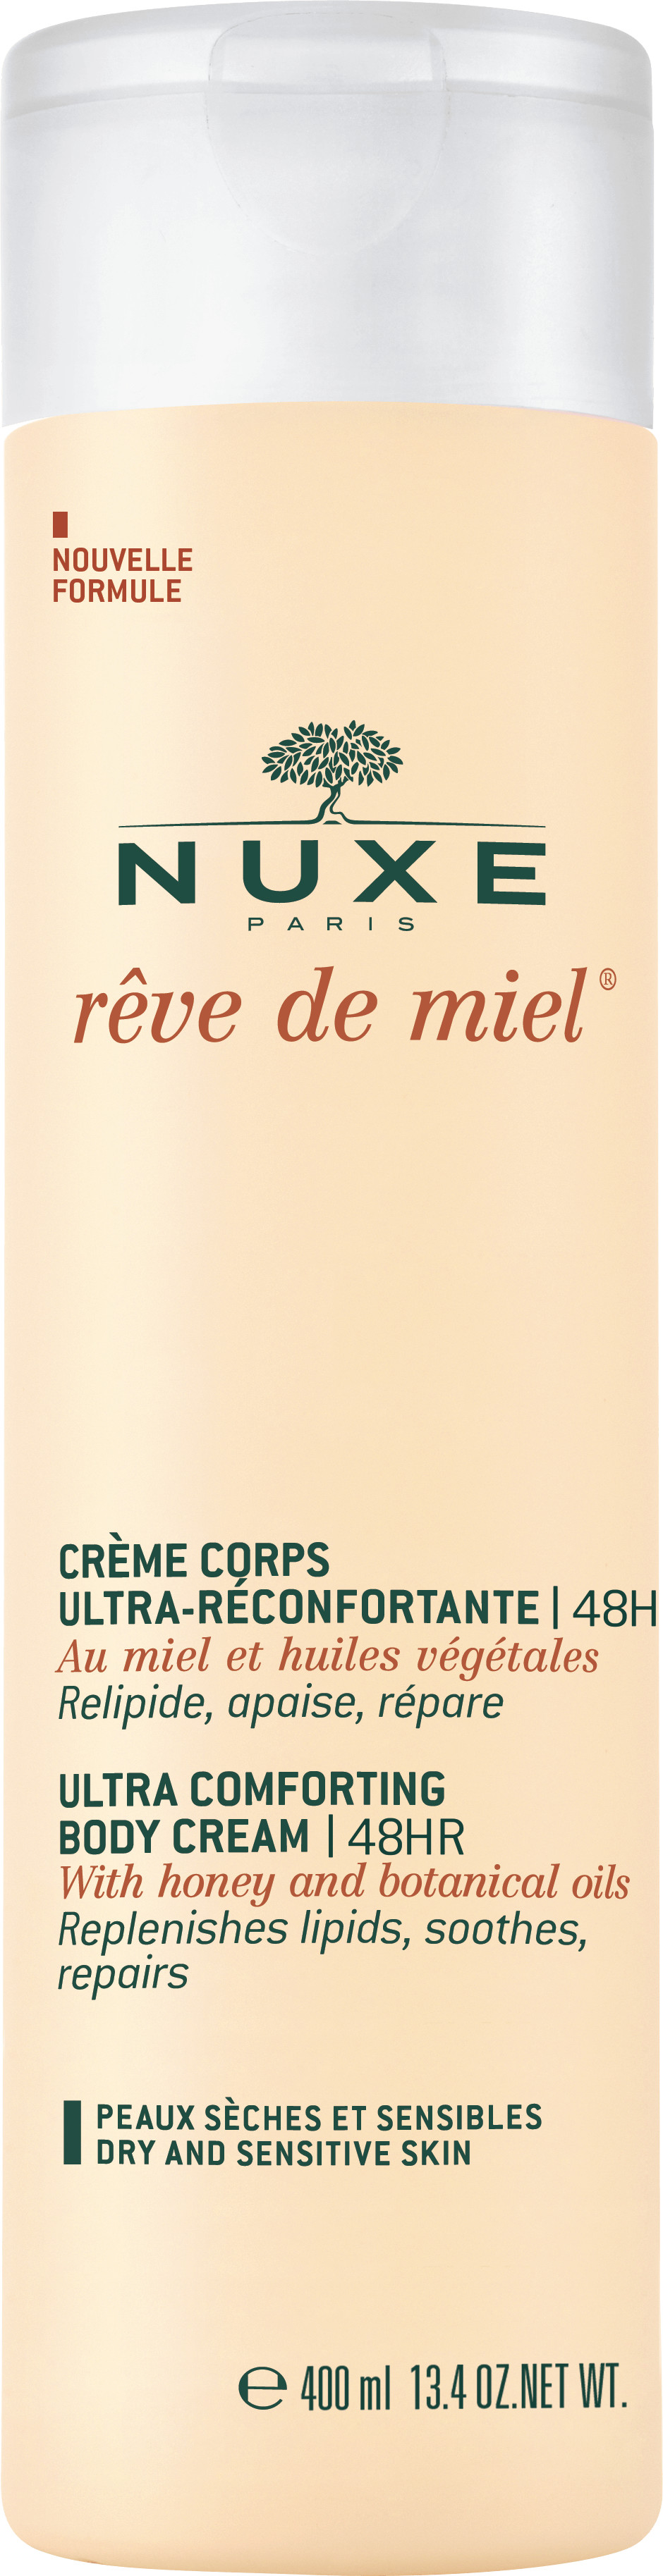 Nuxe Reve de Miel Creme Corps Ultra-Reconfortante 48H Balsam do ciała 400 ml